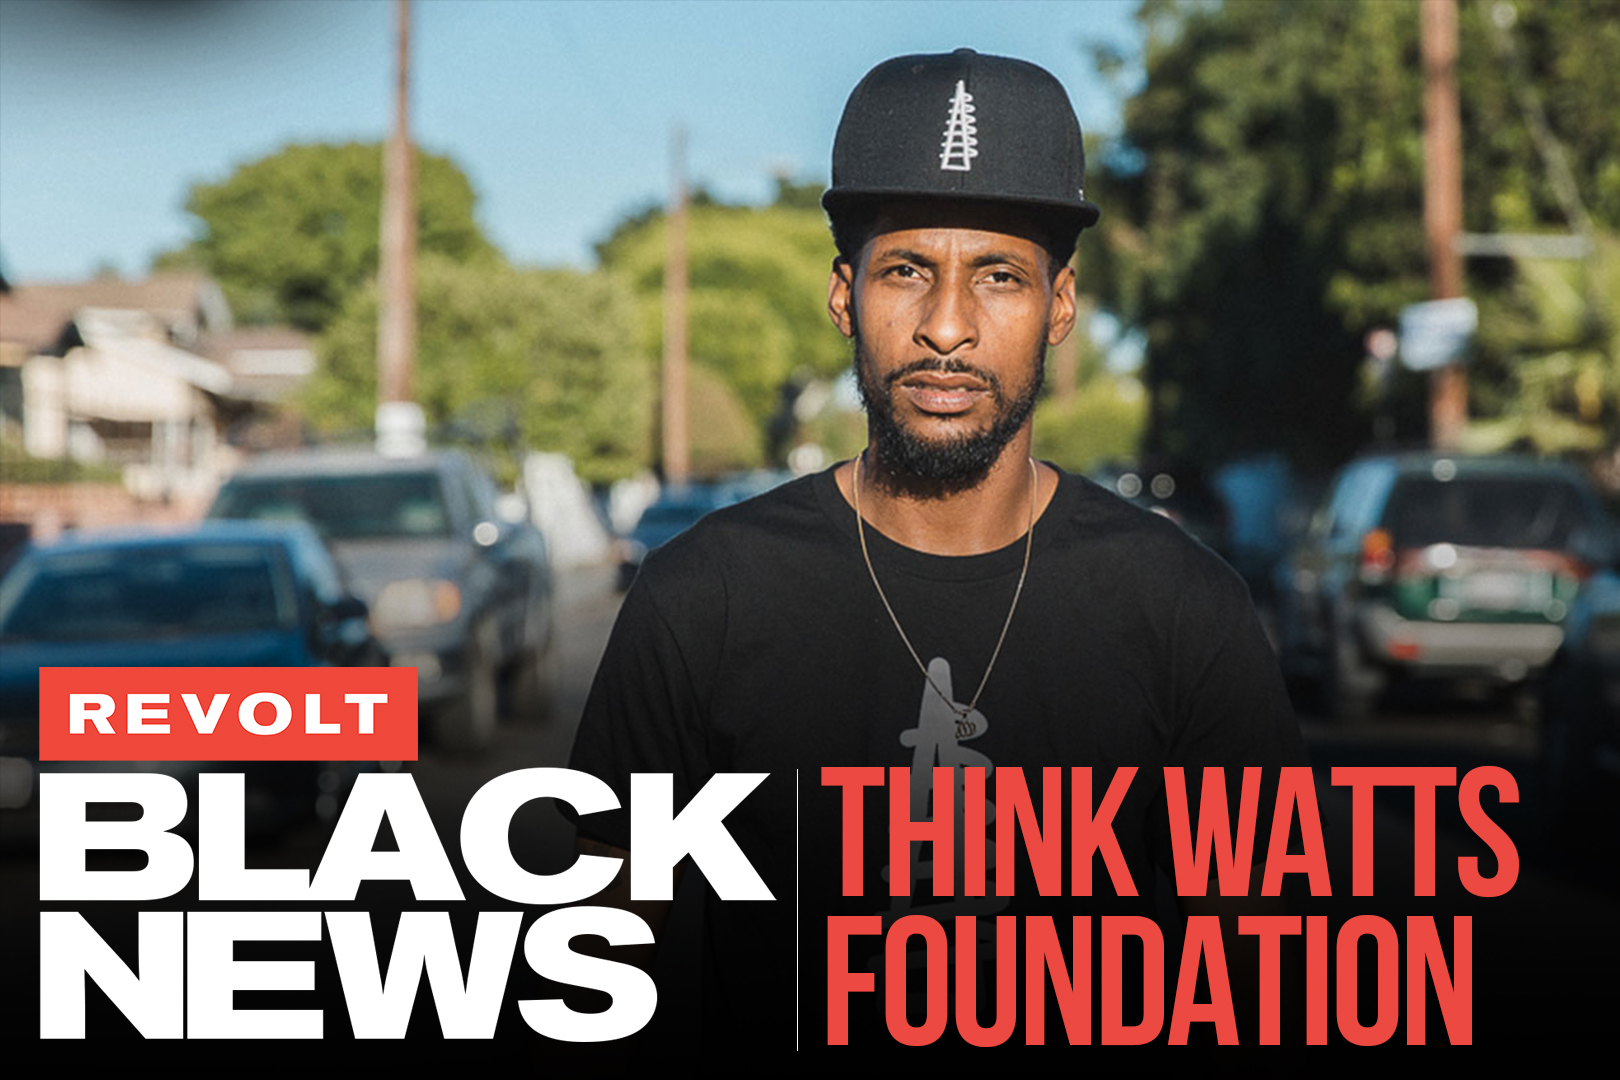 Stix - REVOLT BLACK NEWS